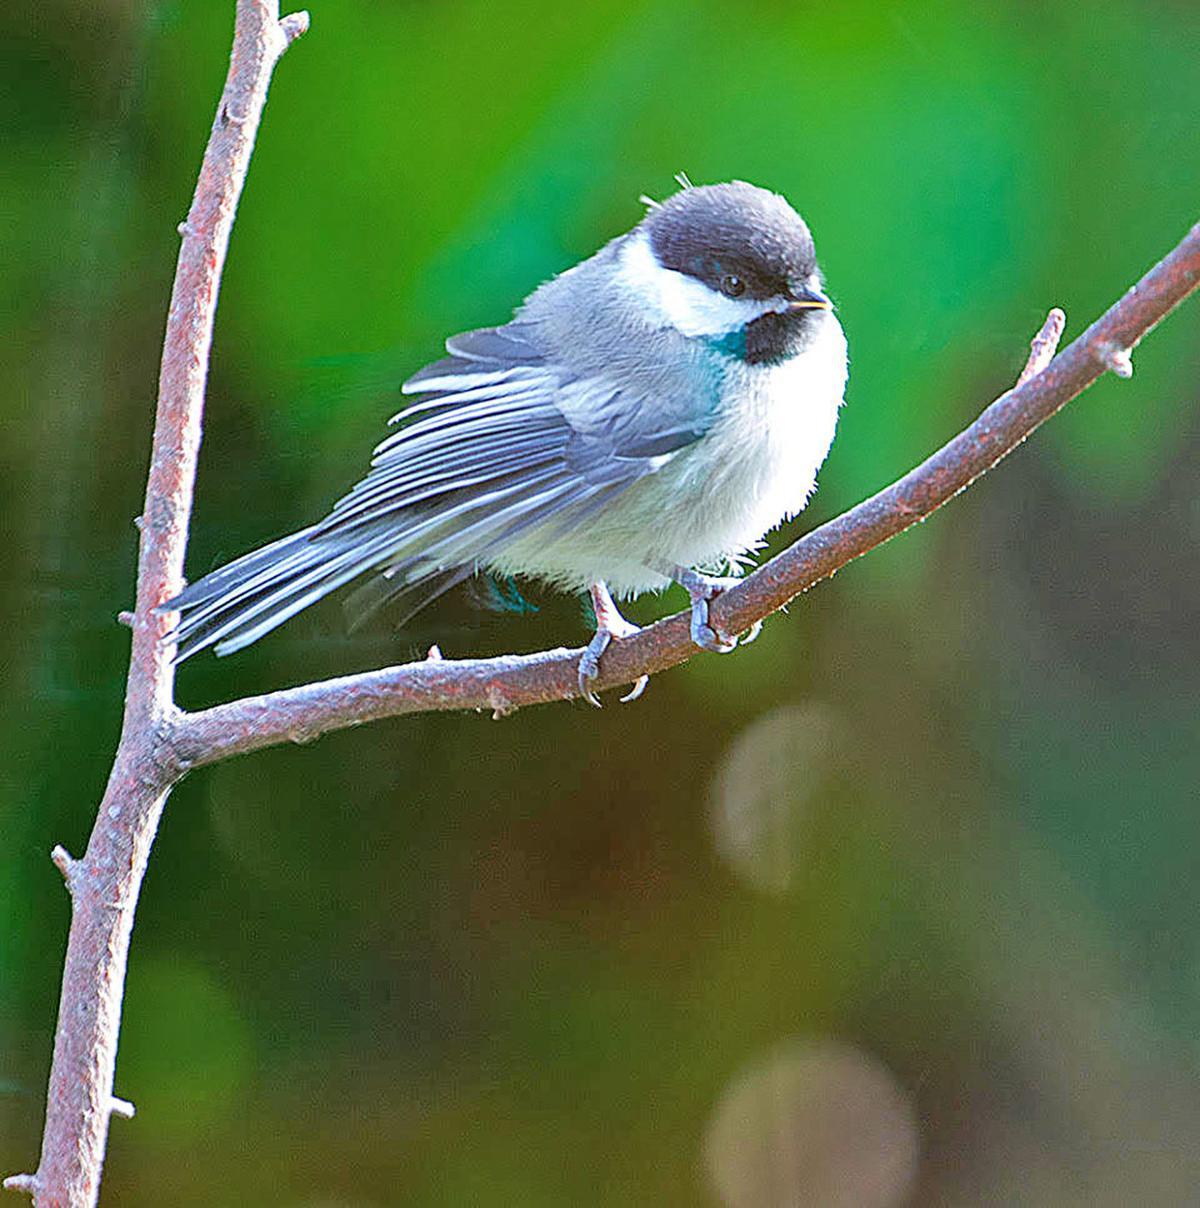 Black-capped chickadee adult